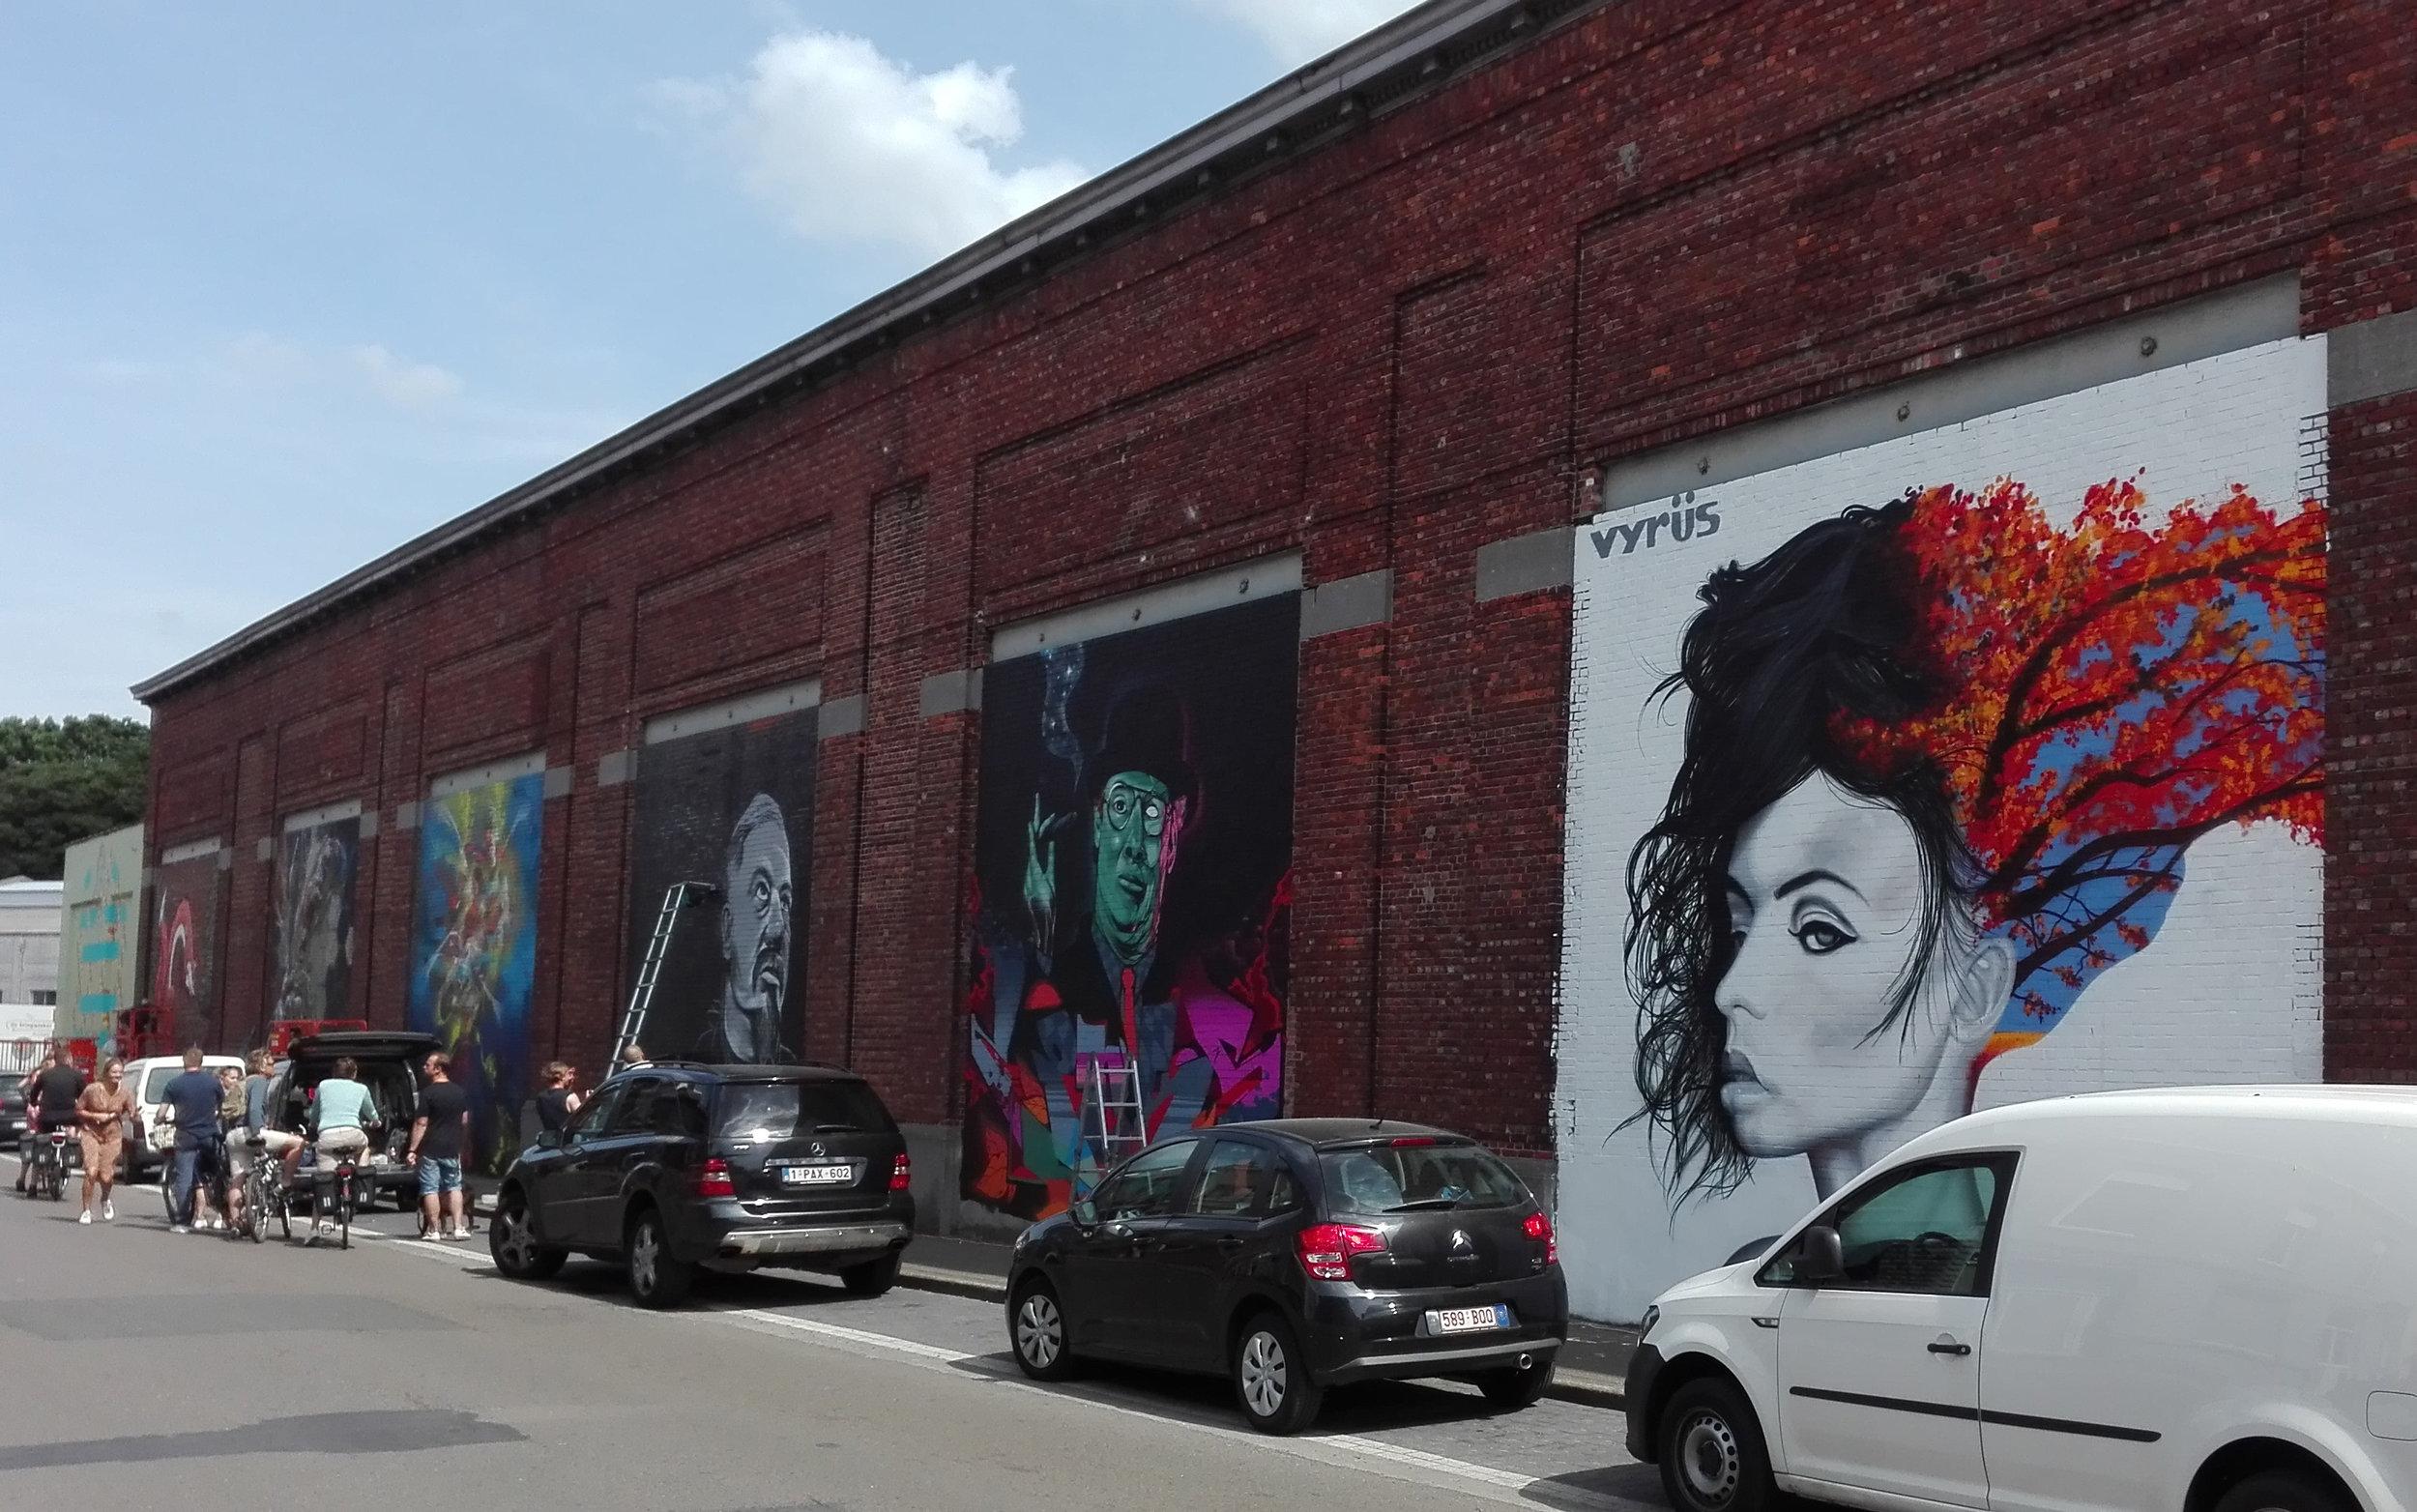 Een hele straat vol kunst, met werken van Vyrüs, Eyes B, K.Shit, RBLX, E.T., Matthew Dawn, Linksone en STS Jasta.